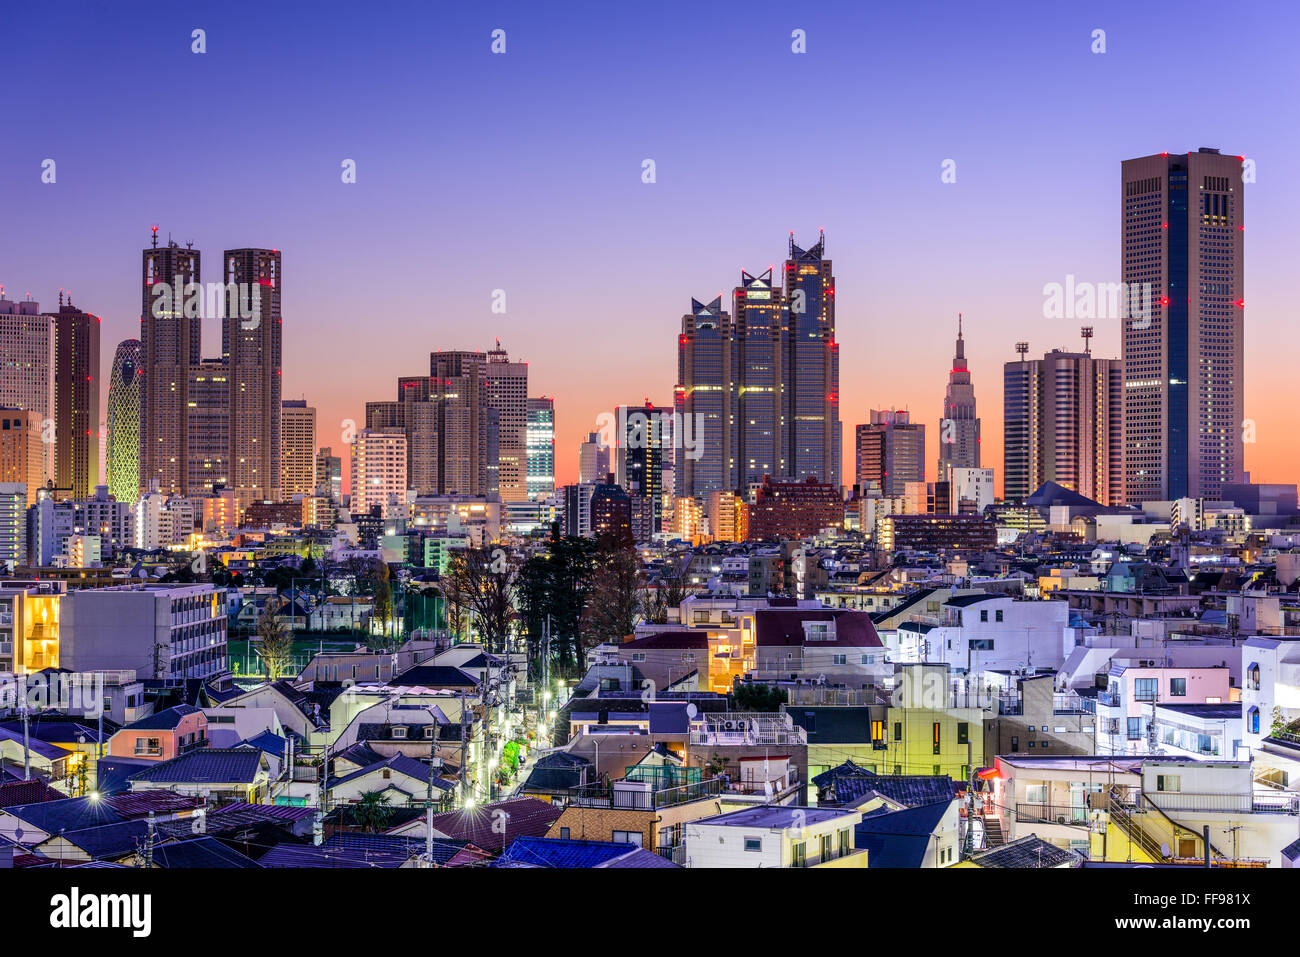 tokyo dark city skyline - photo #21